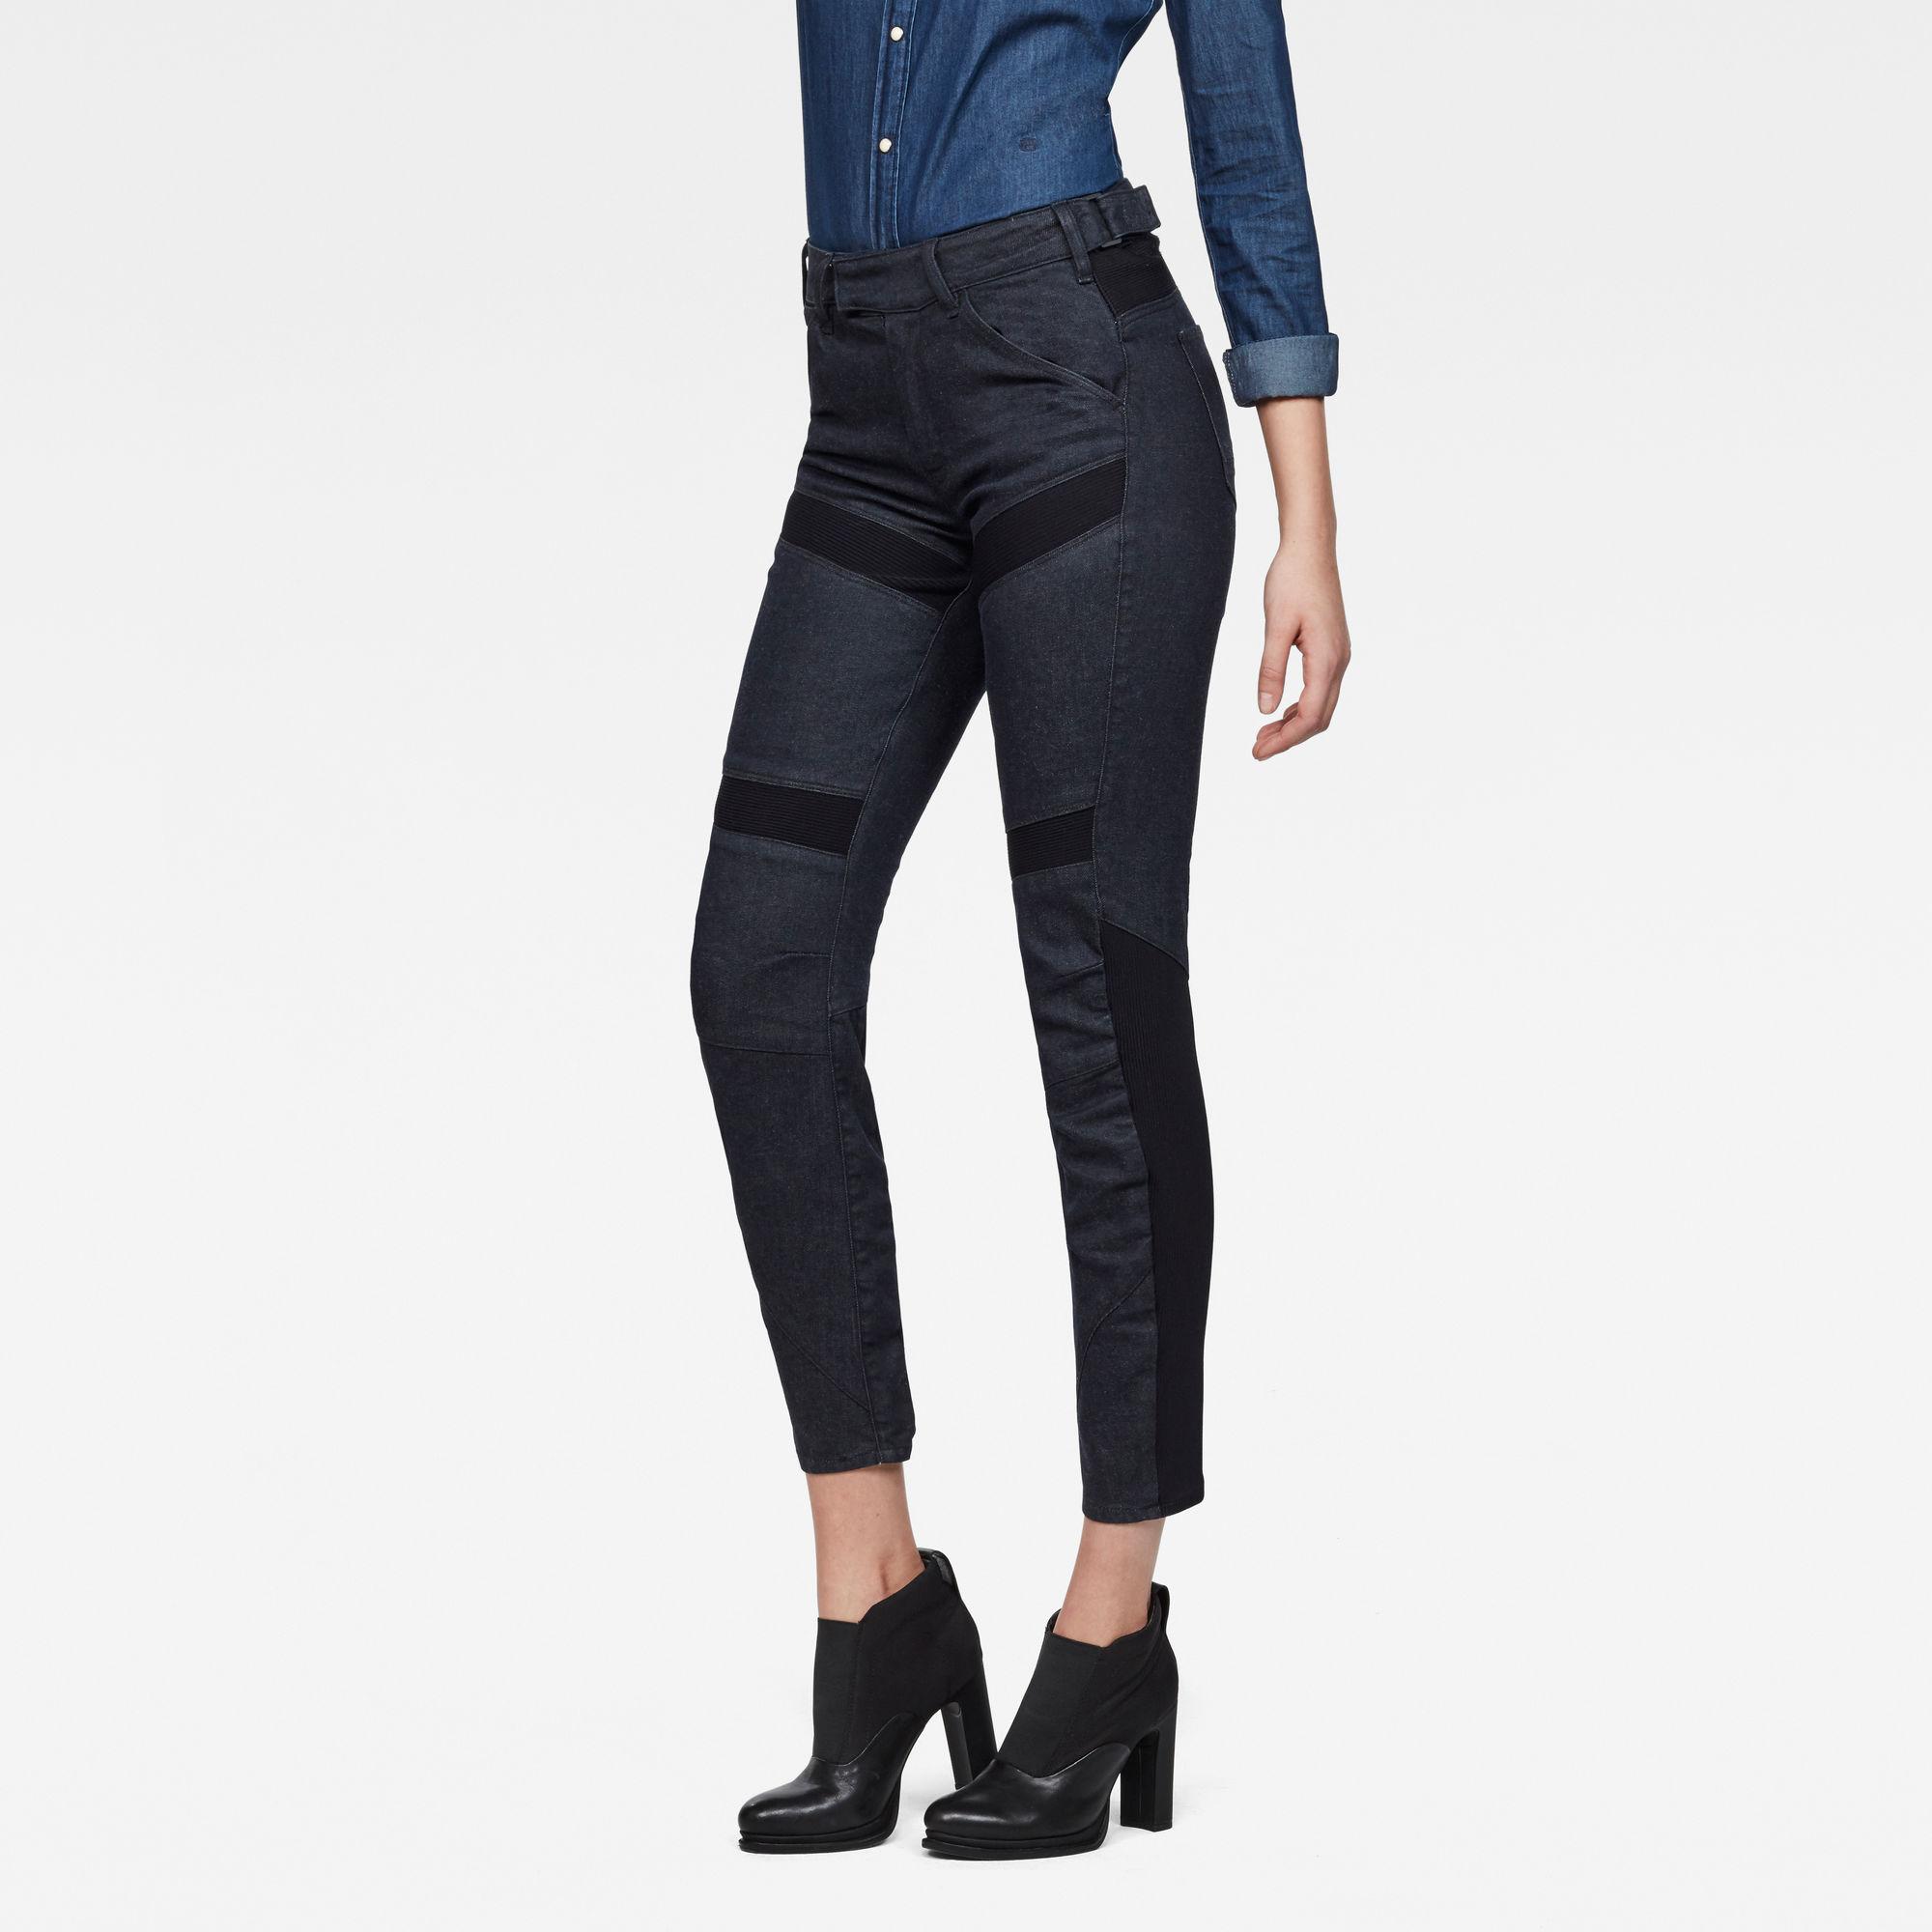 Raw Essentials Motac-X 3D High waist Skinny Ankle Jeans